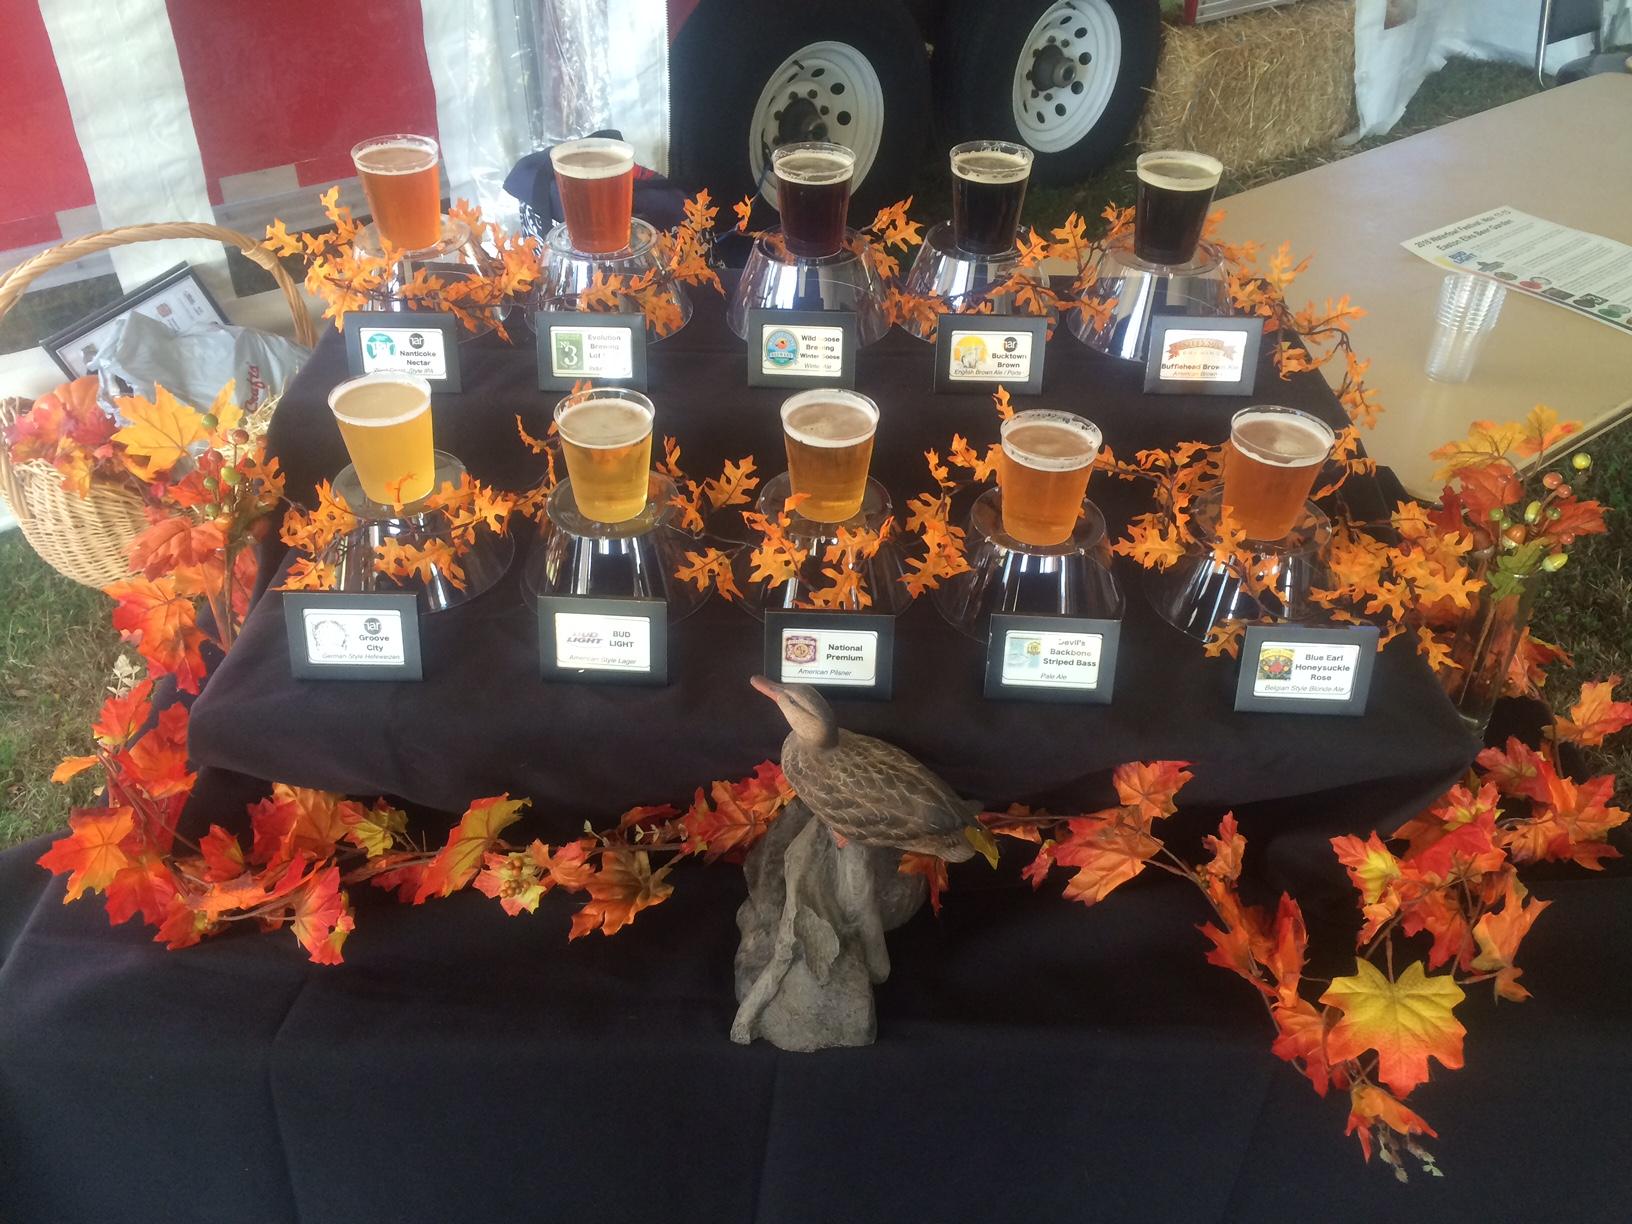 Easton Elks Beer Garden at Waterfowl Festival 11.12.16